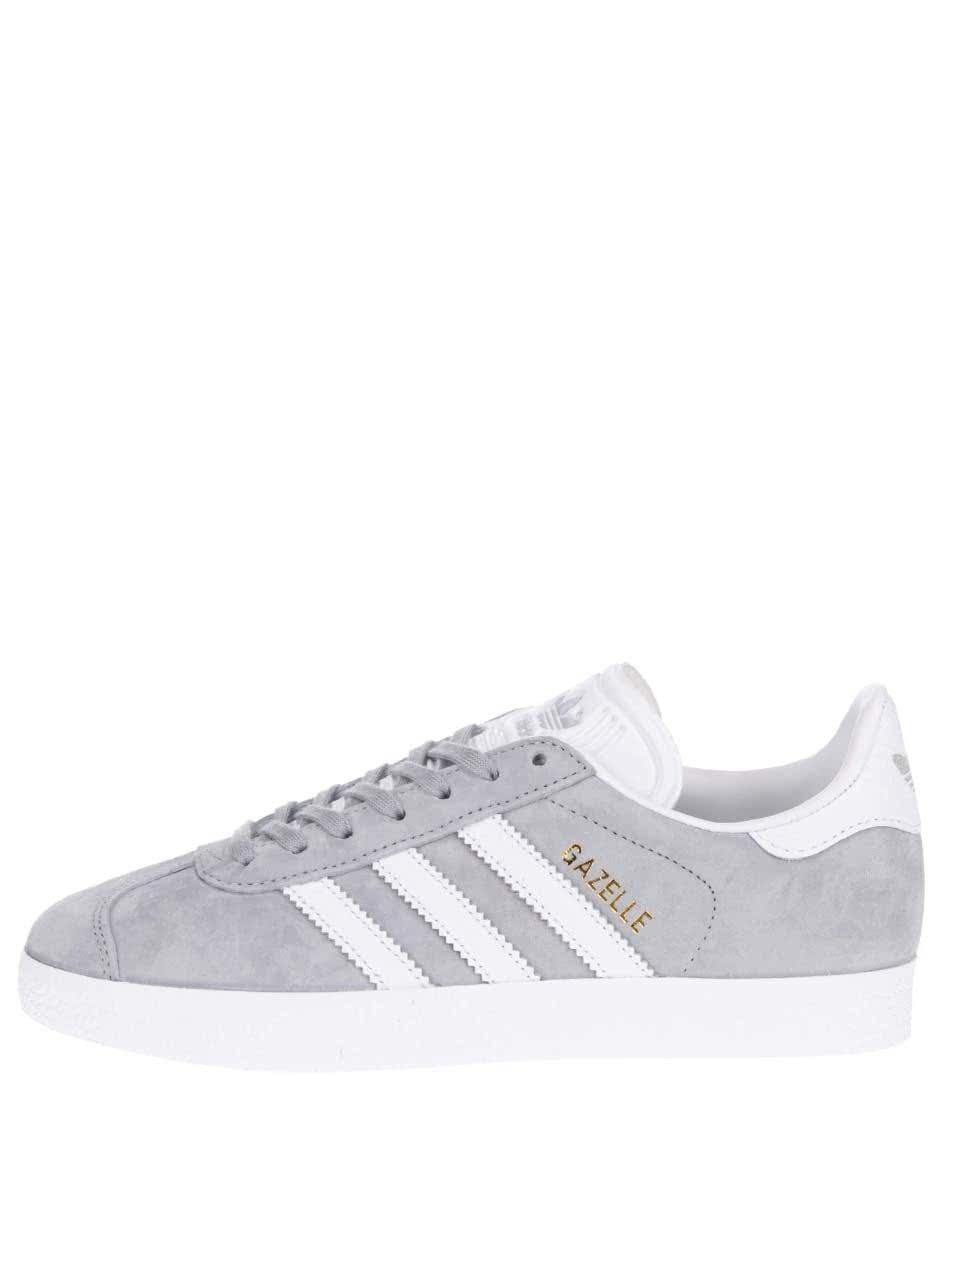 Bílo-šedé dámské tenisky adidas Originals Gazelle